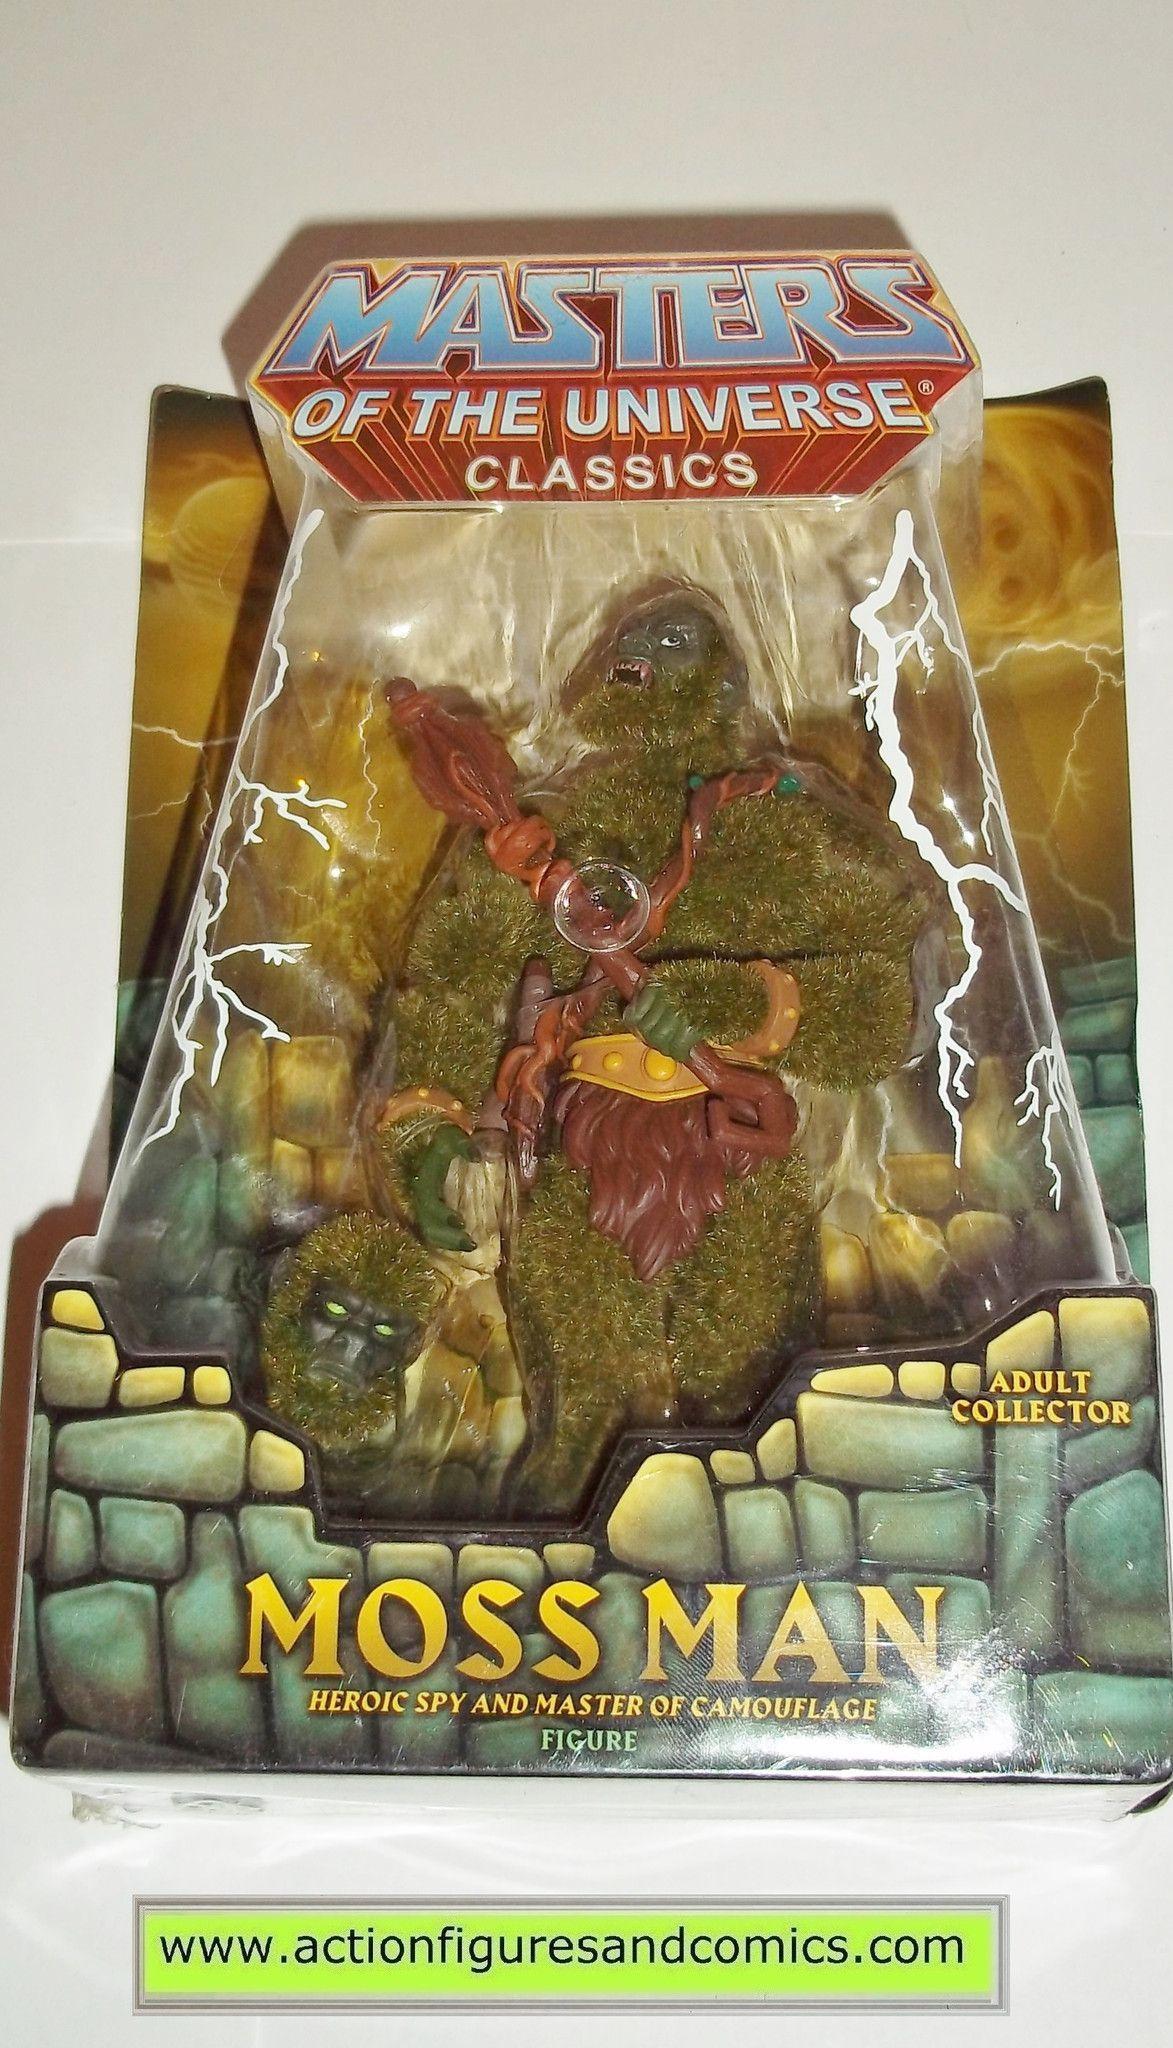 Masters of the Universe MOSS MAN Classics he-man motu action figures mattel mib moc mip